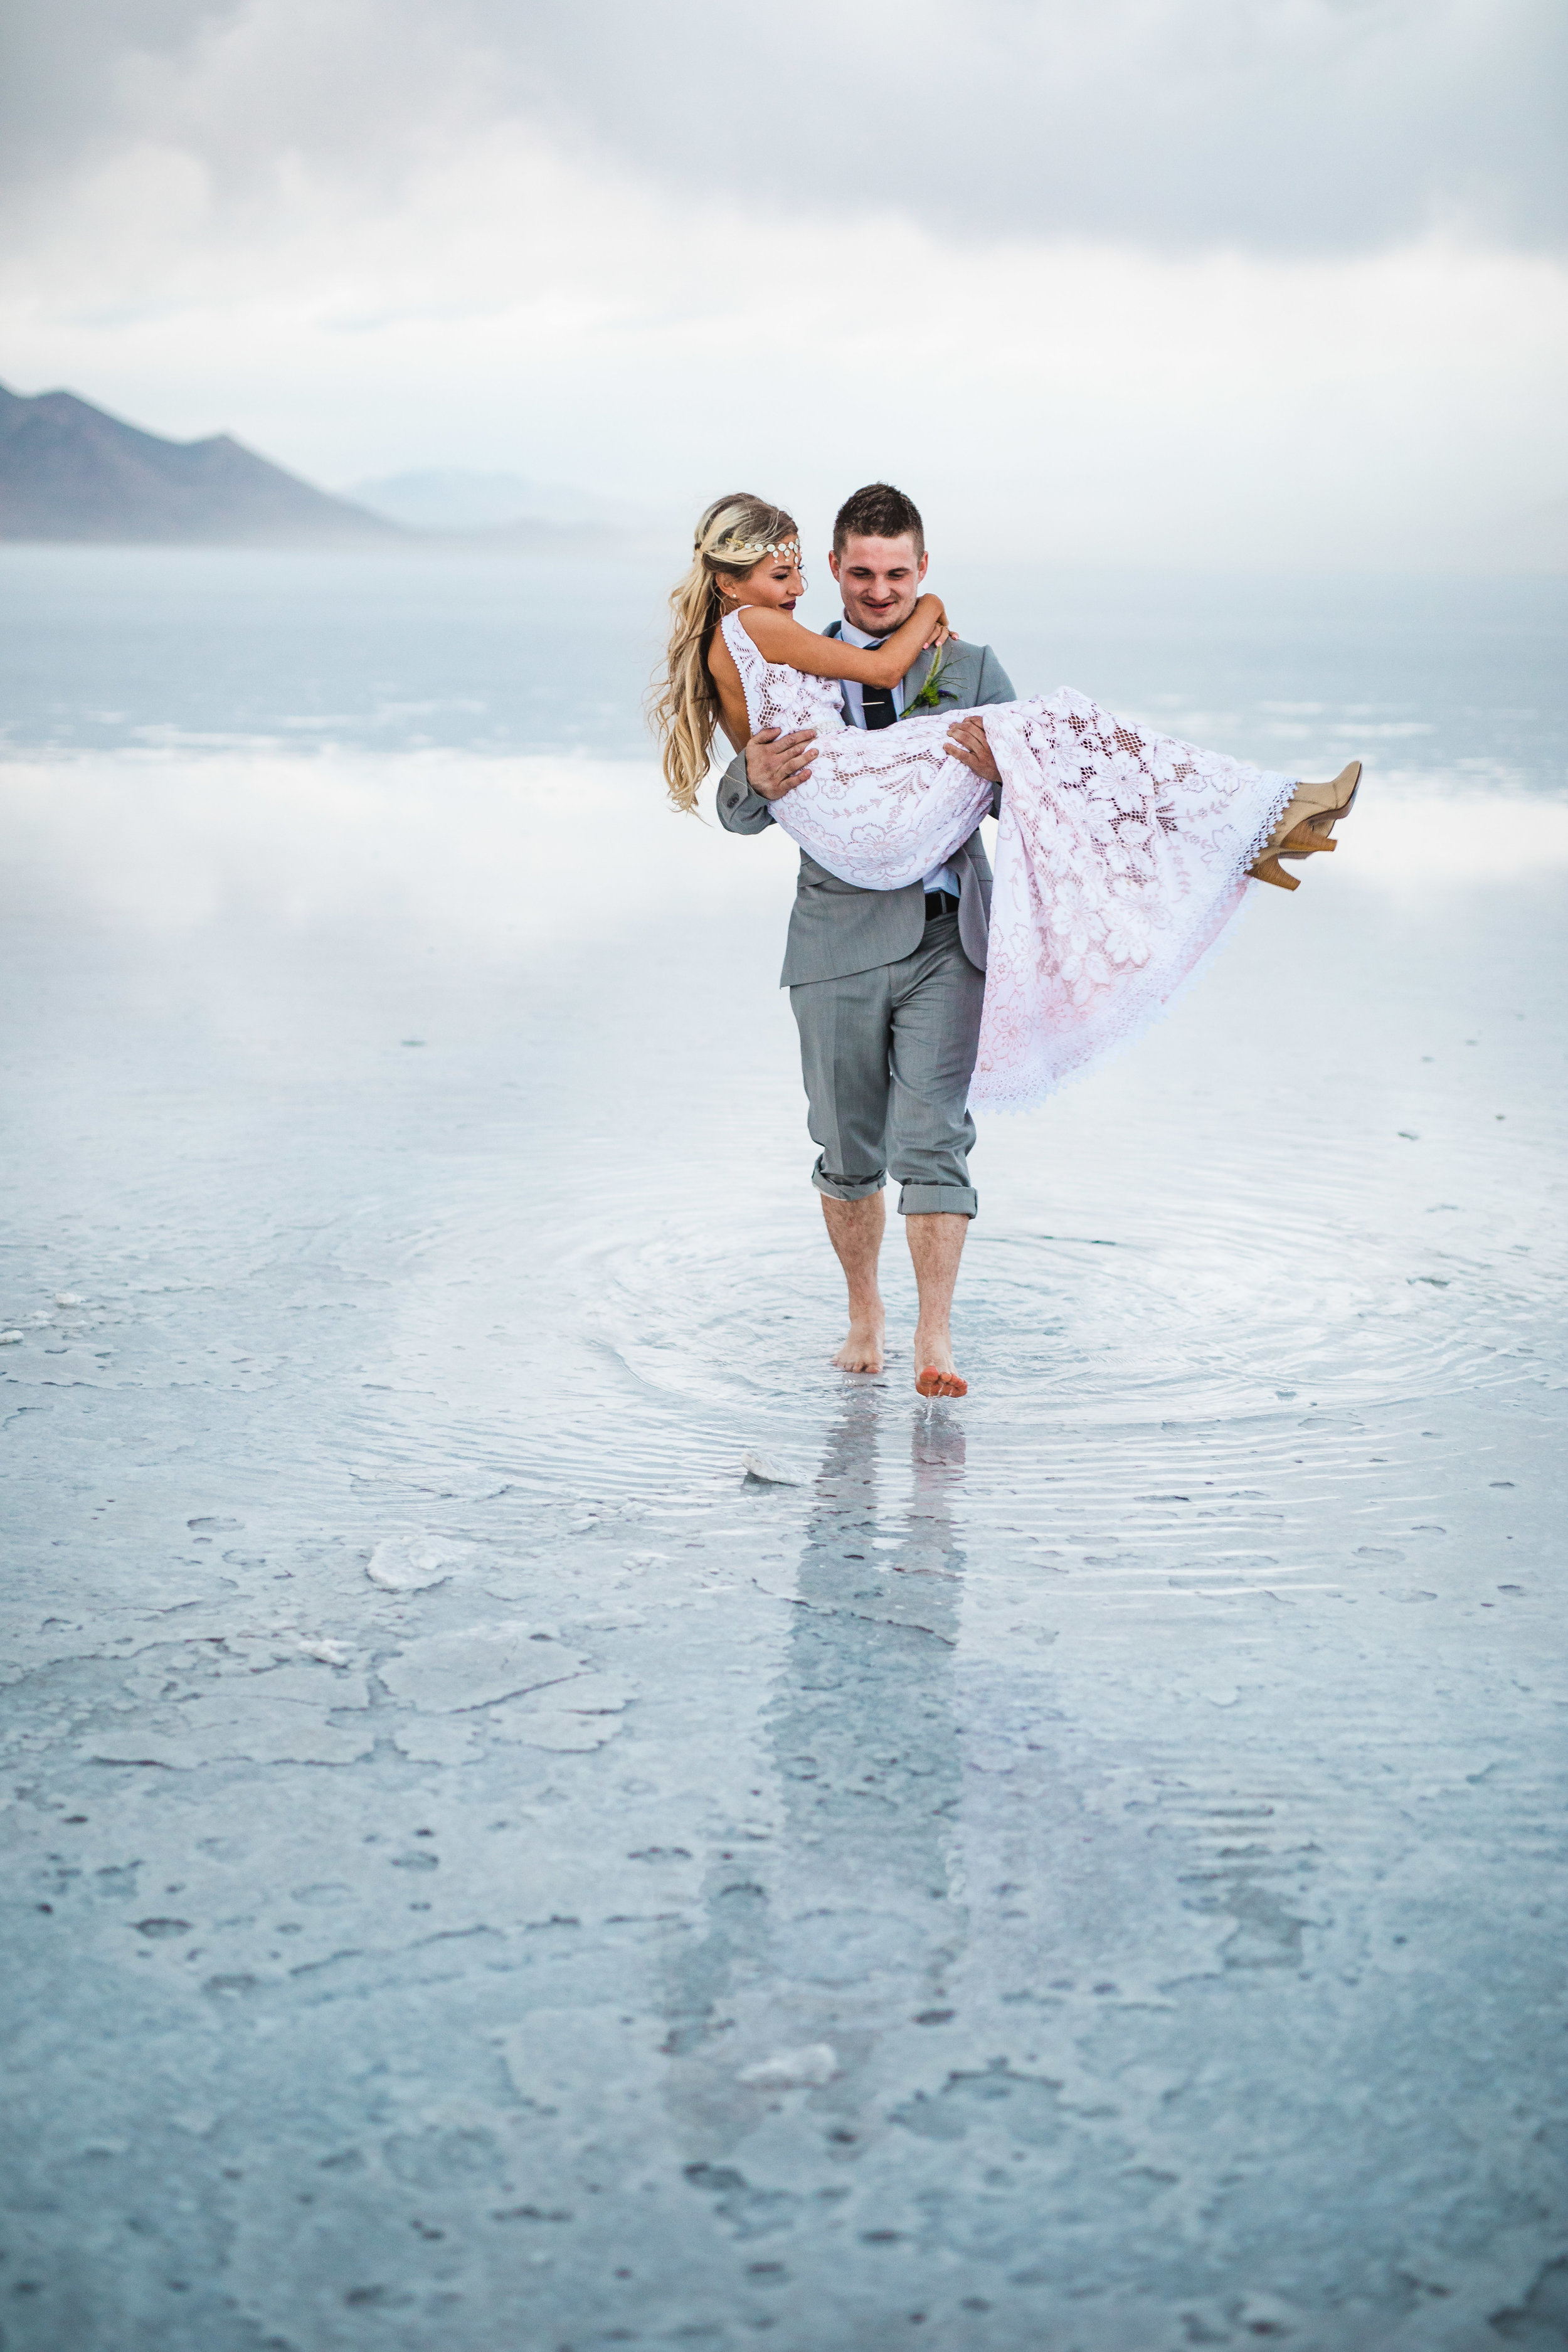 Epic destination wedding photography Bonneville Salt Flats